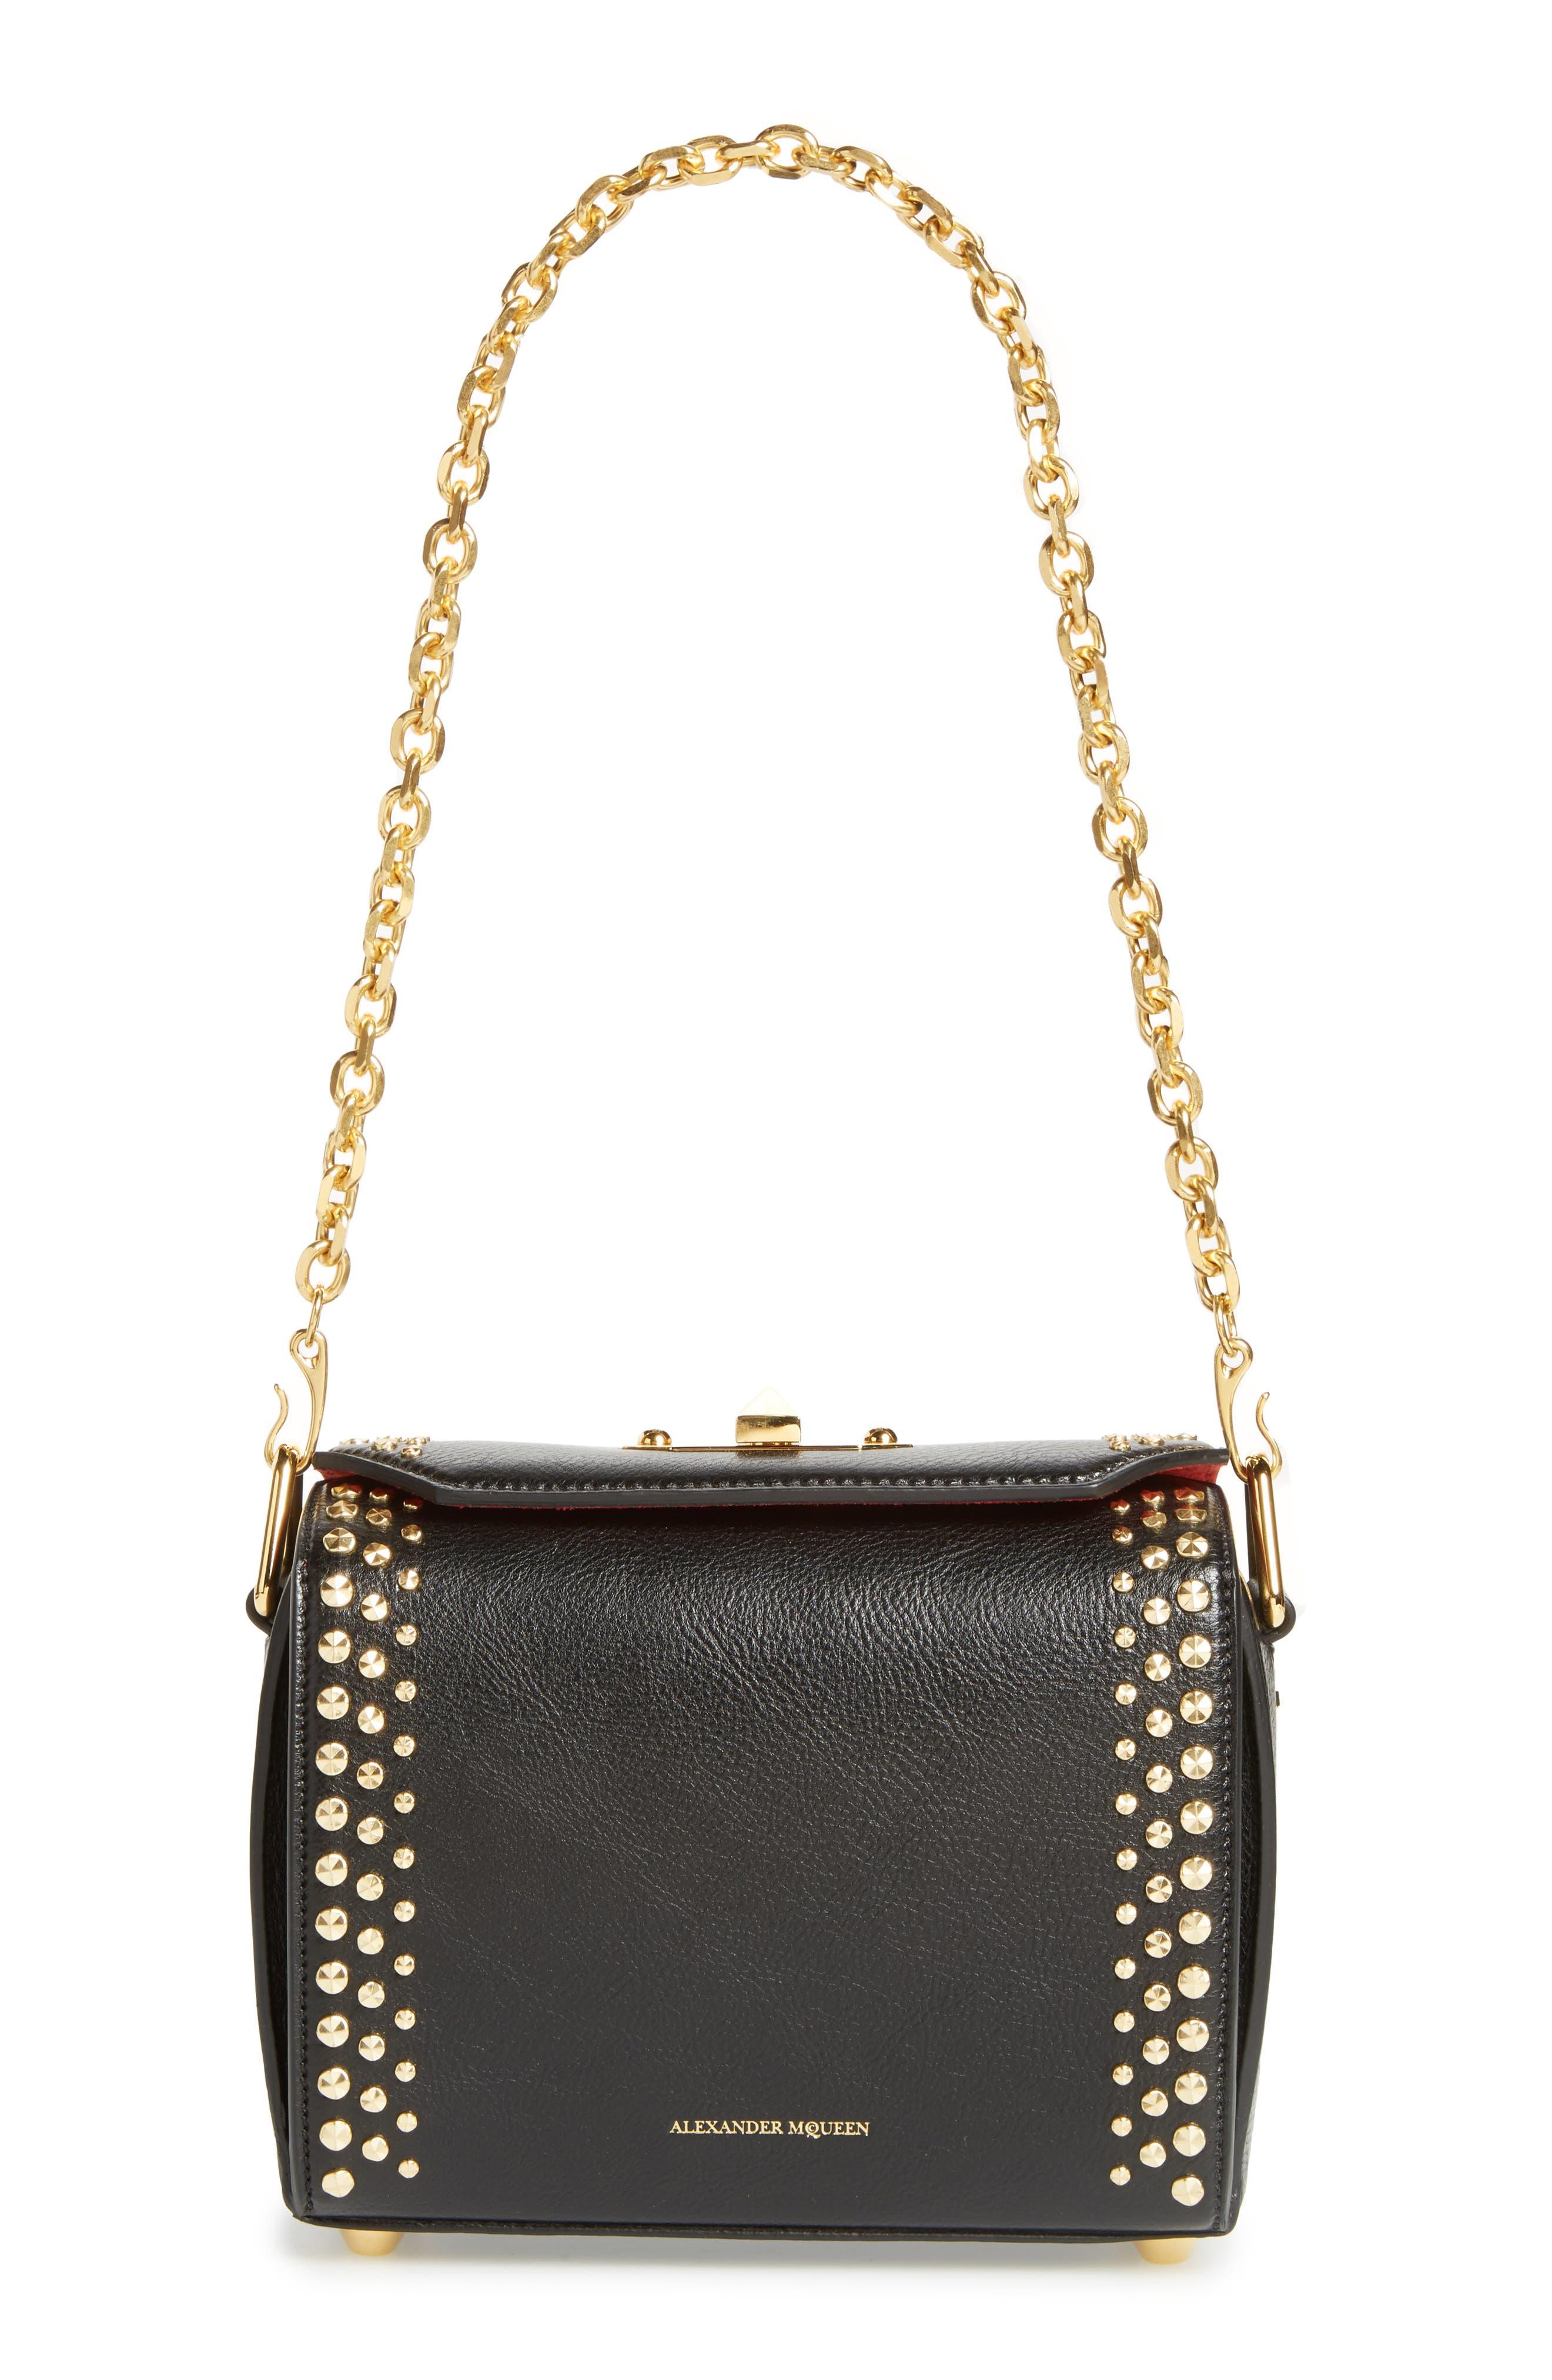 5fc347ed83c6 Alexander Mcqueen Handbags   Wallets for Women